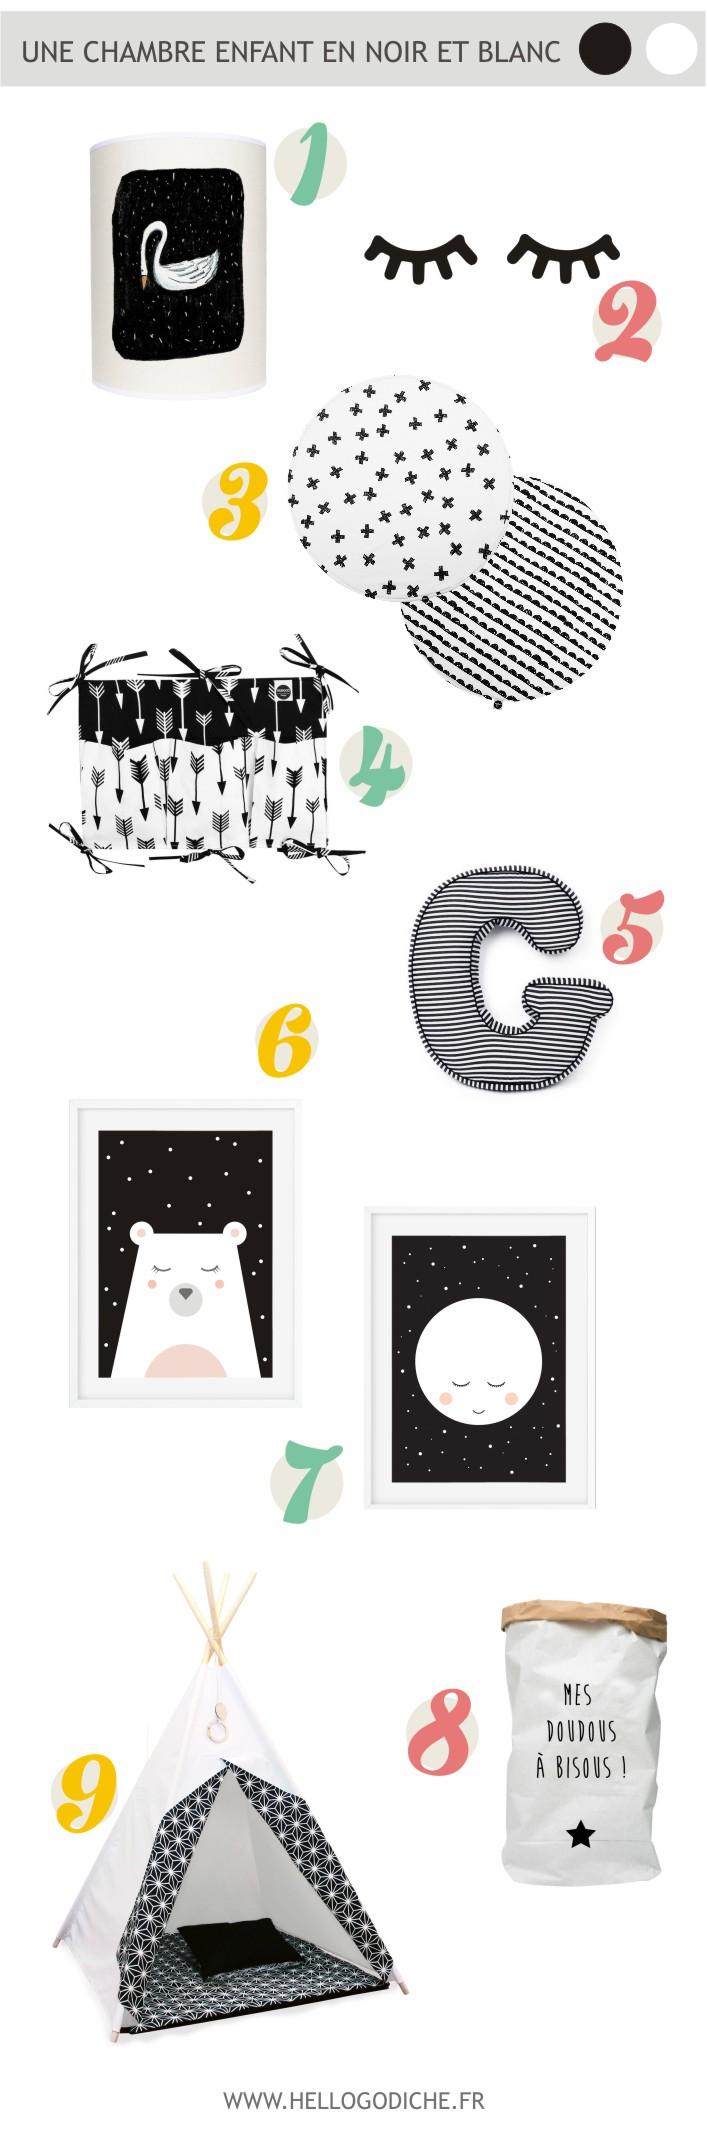 Idees-decoration-shopping-nurserie-chambre-enfant-noir-et-blanc-hello-godiche-4.JPG